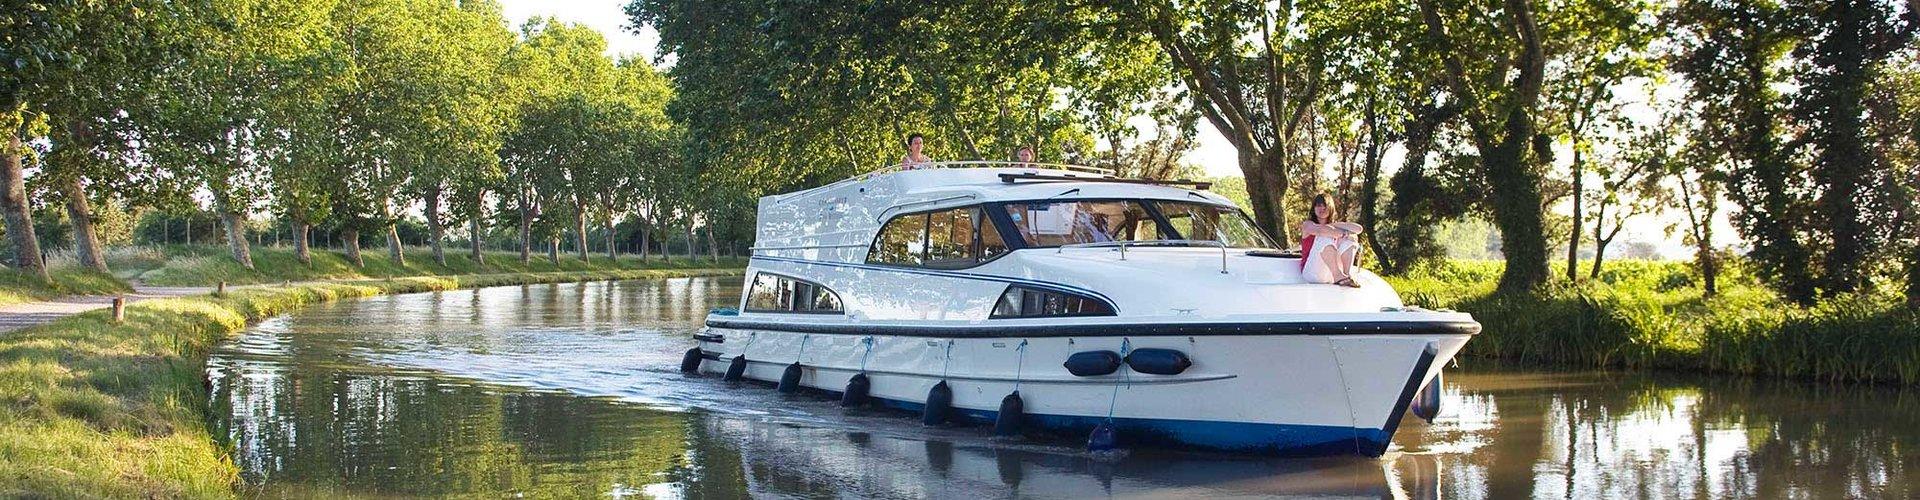 Barca Mystique di Le Boat